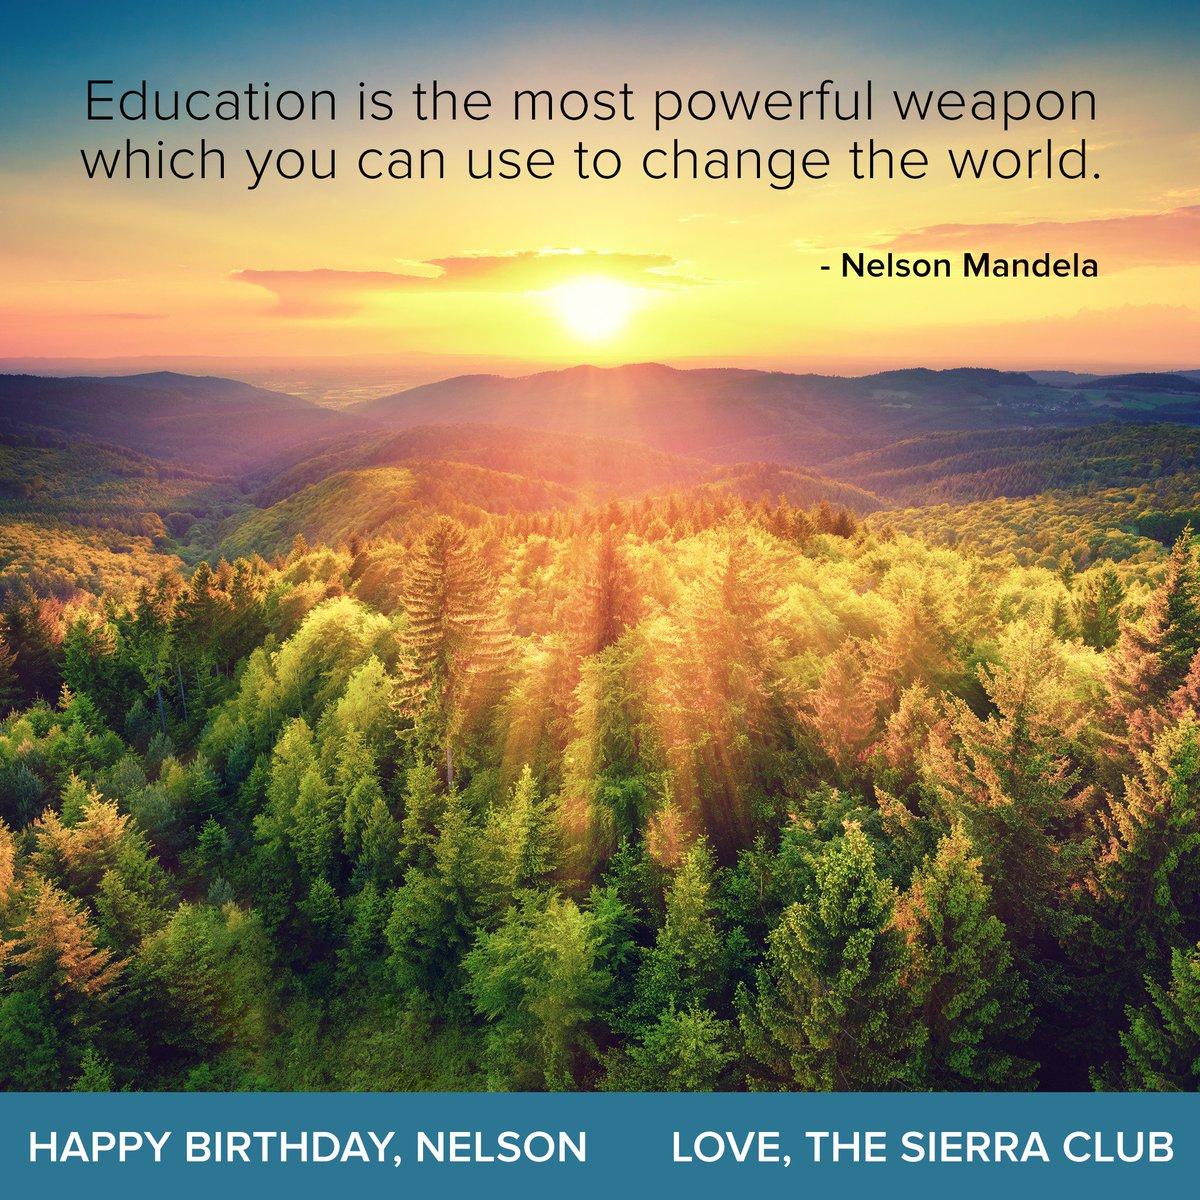 Nelson Mandela was born on July 18, 1918. #WednesdayWisdom